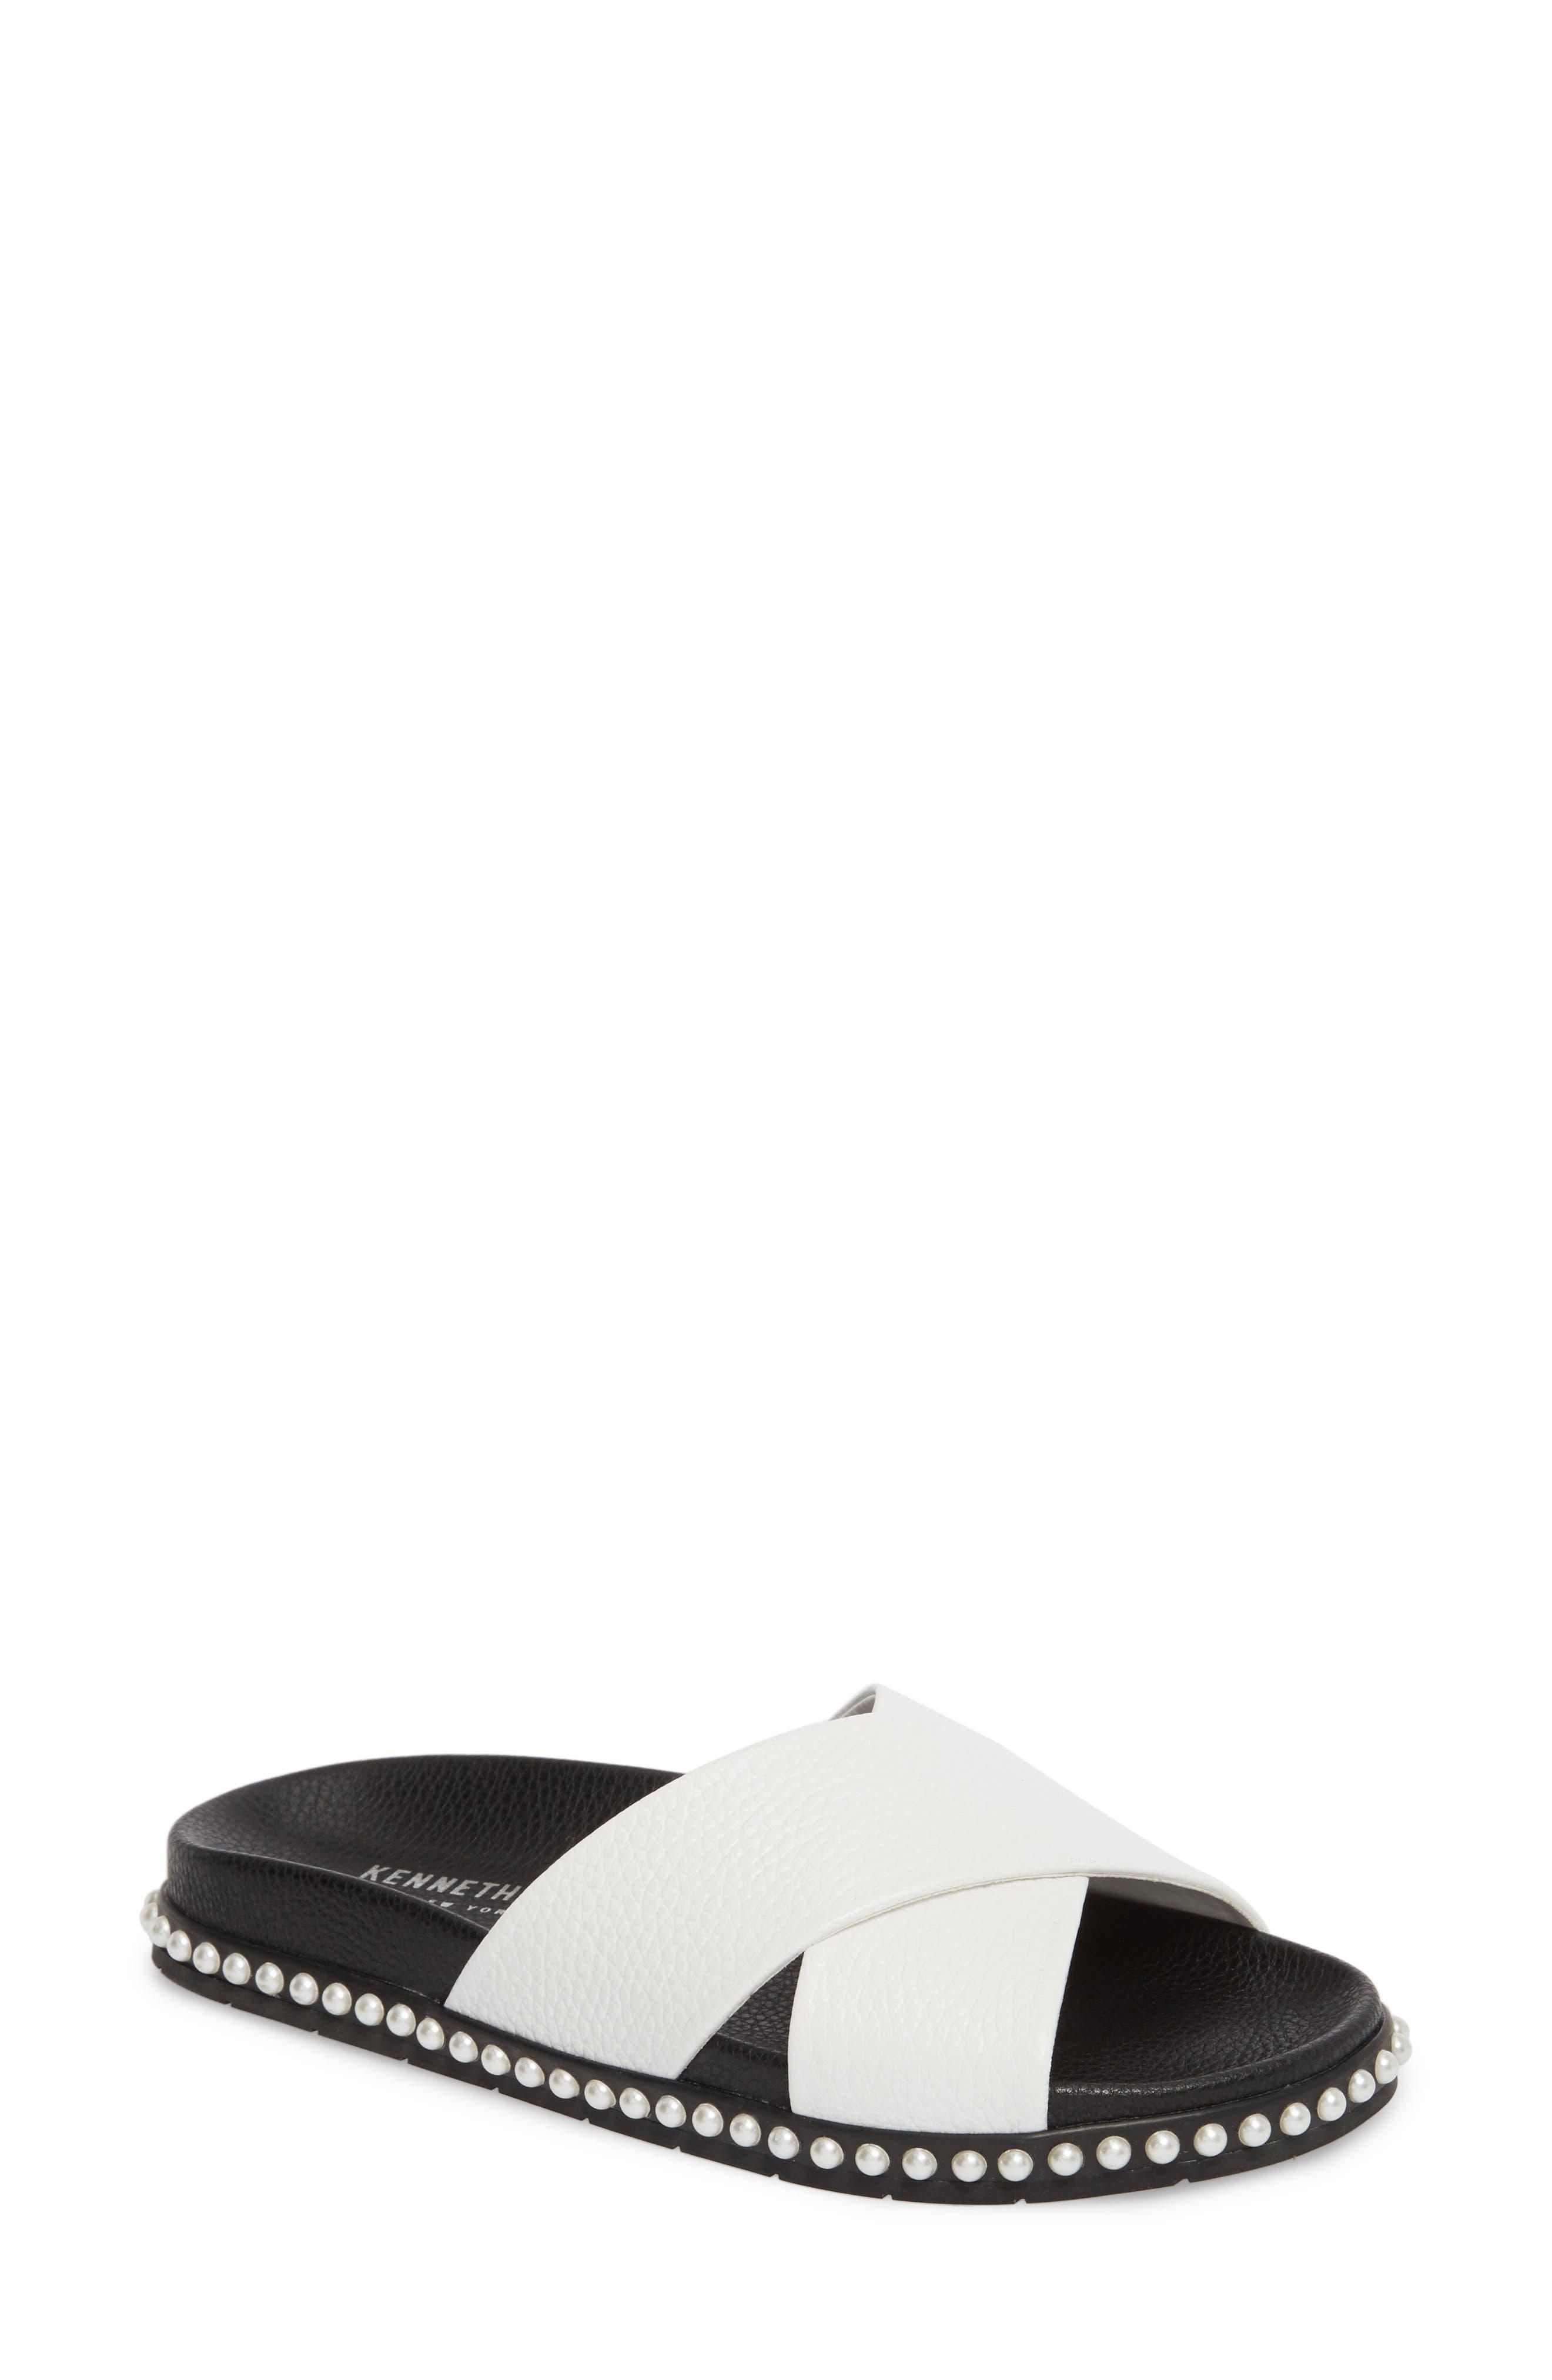 Xiomana Slide Sandal,                         Main,                         color, White Leather